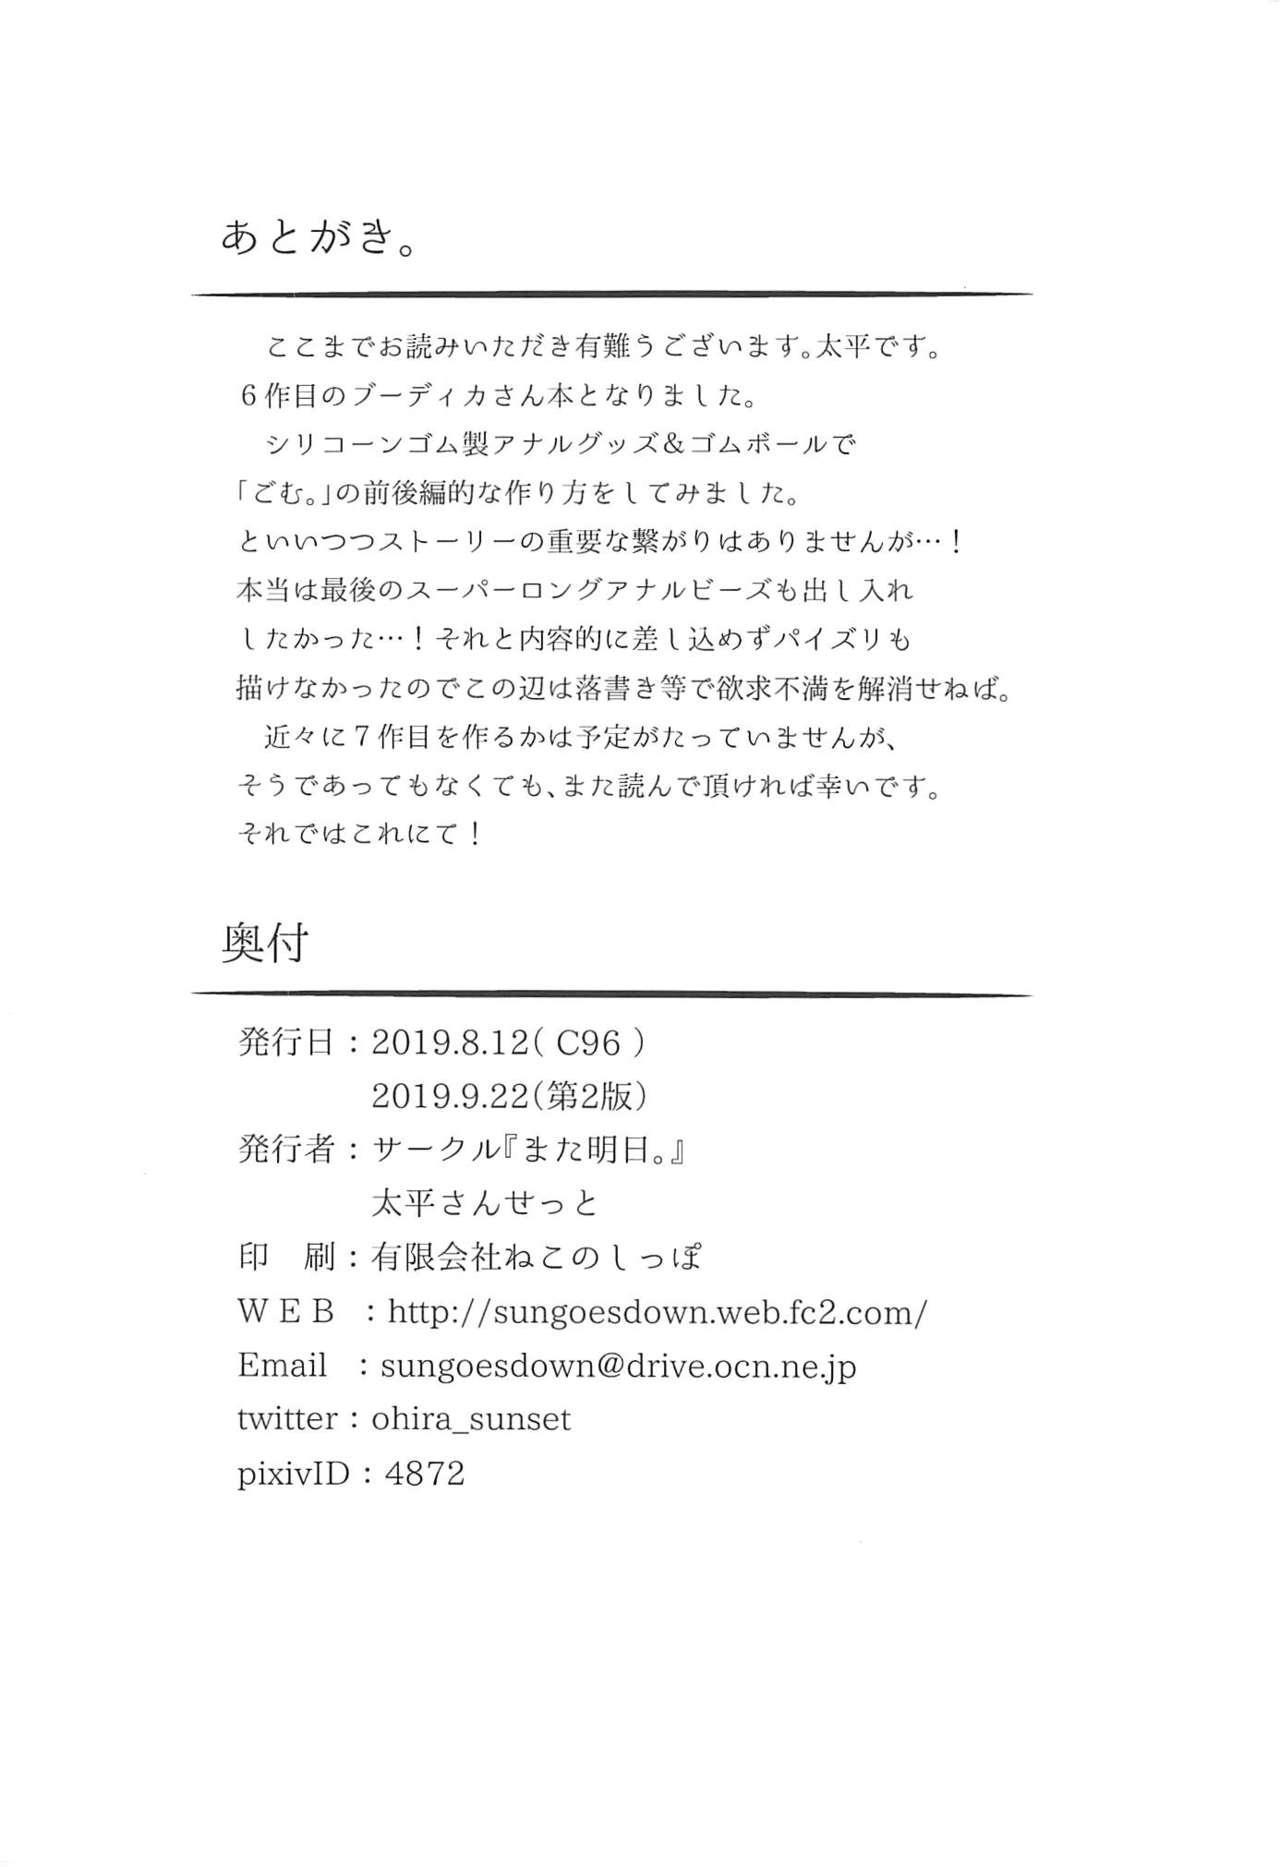 [Mata Ashita. (Oohira Sunset)] Boudica-san to Gom. -Anal Hen- (Fate/Grand Order) [2019-09-22] 24